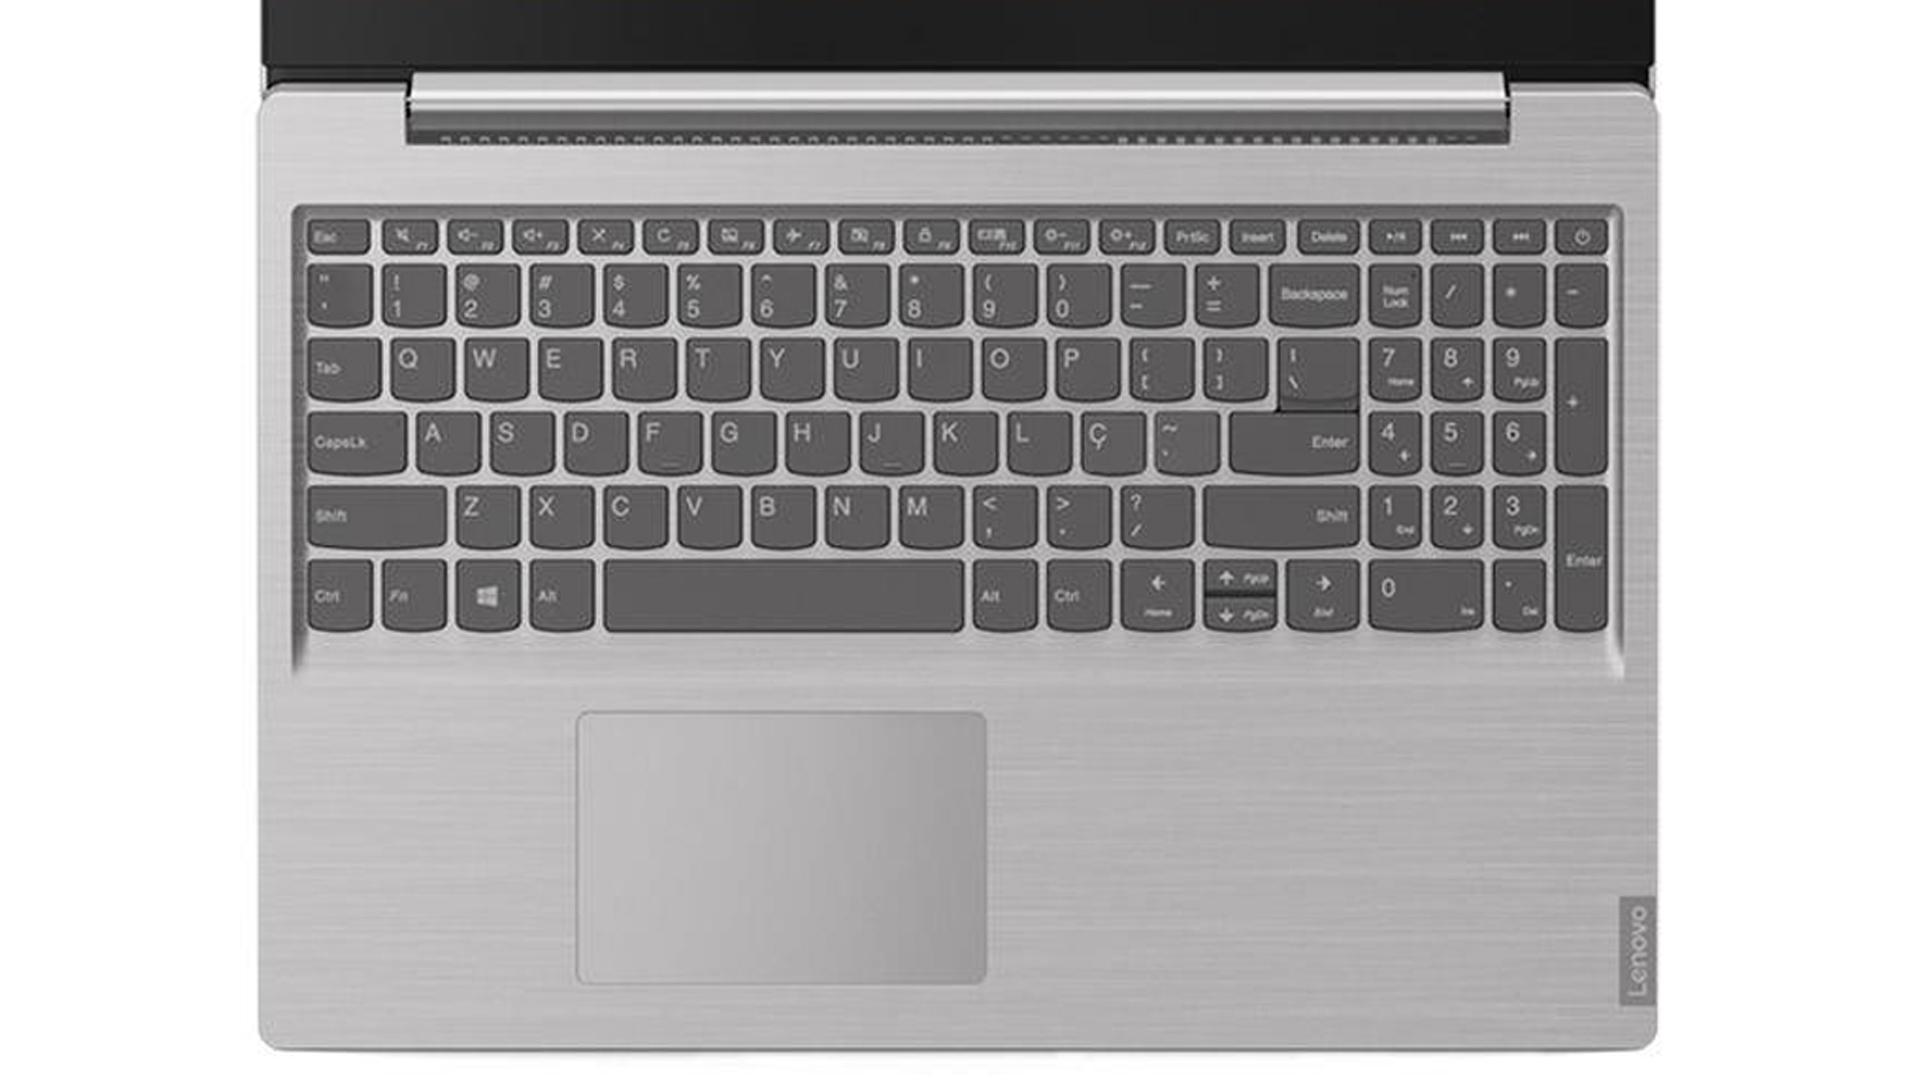 Teclado do IdeaPad S145 (82DJ0001BR)